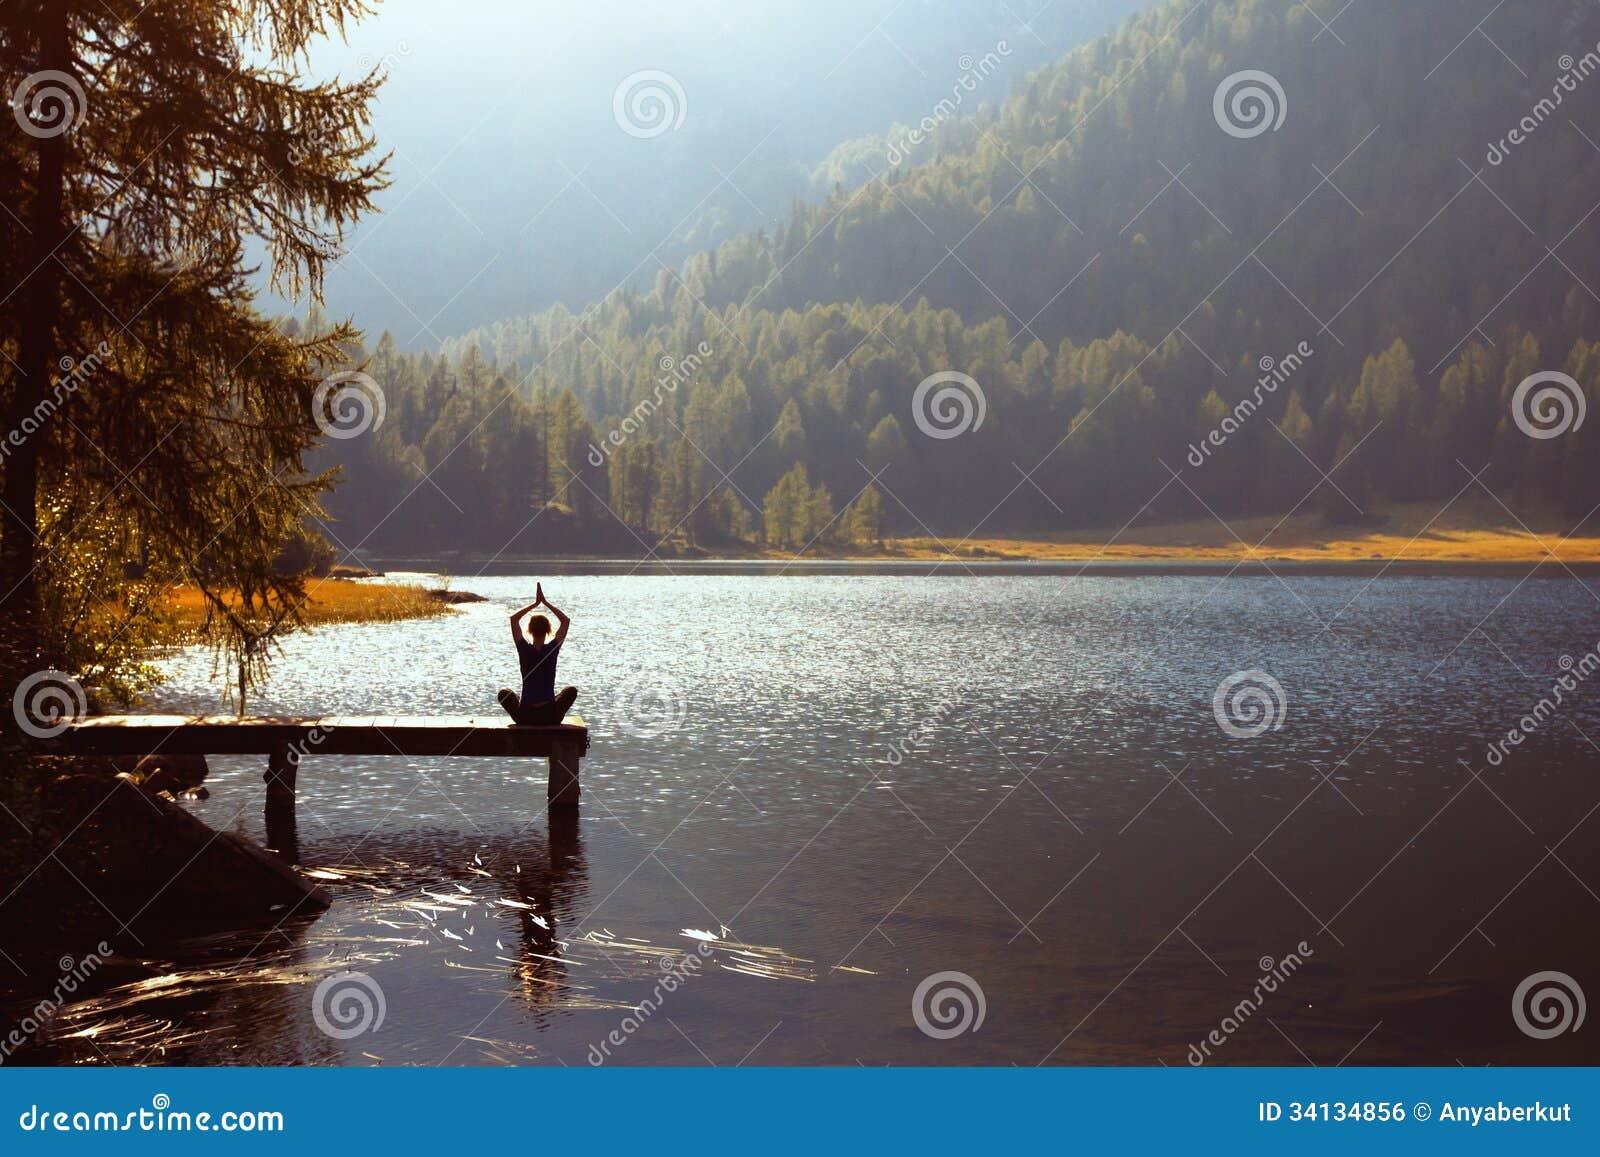 Yoga near the lake